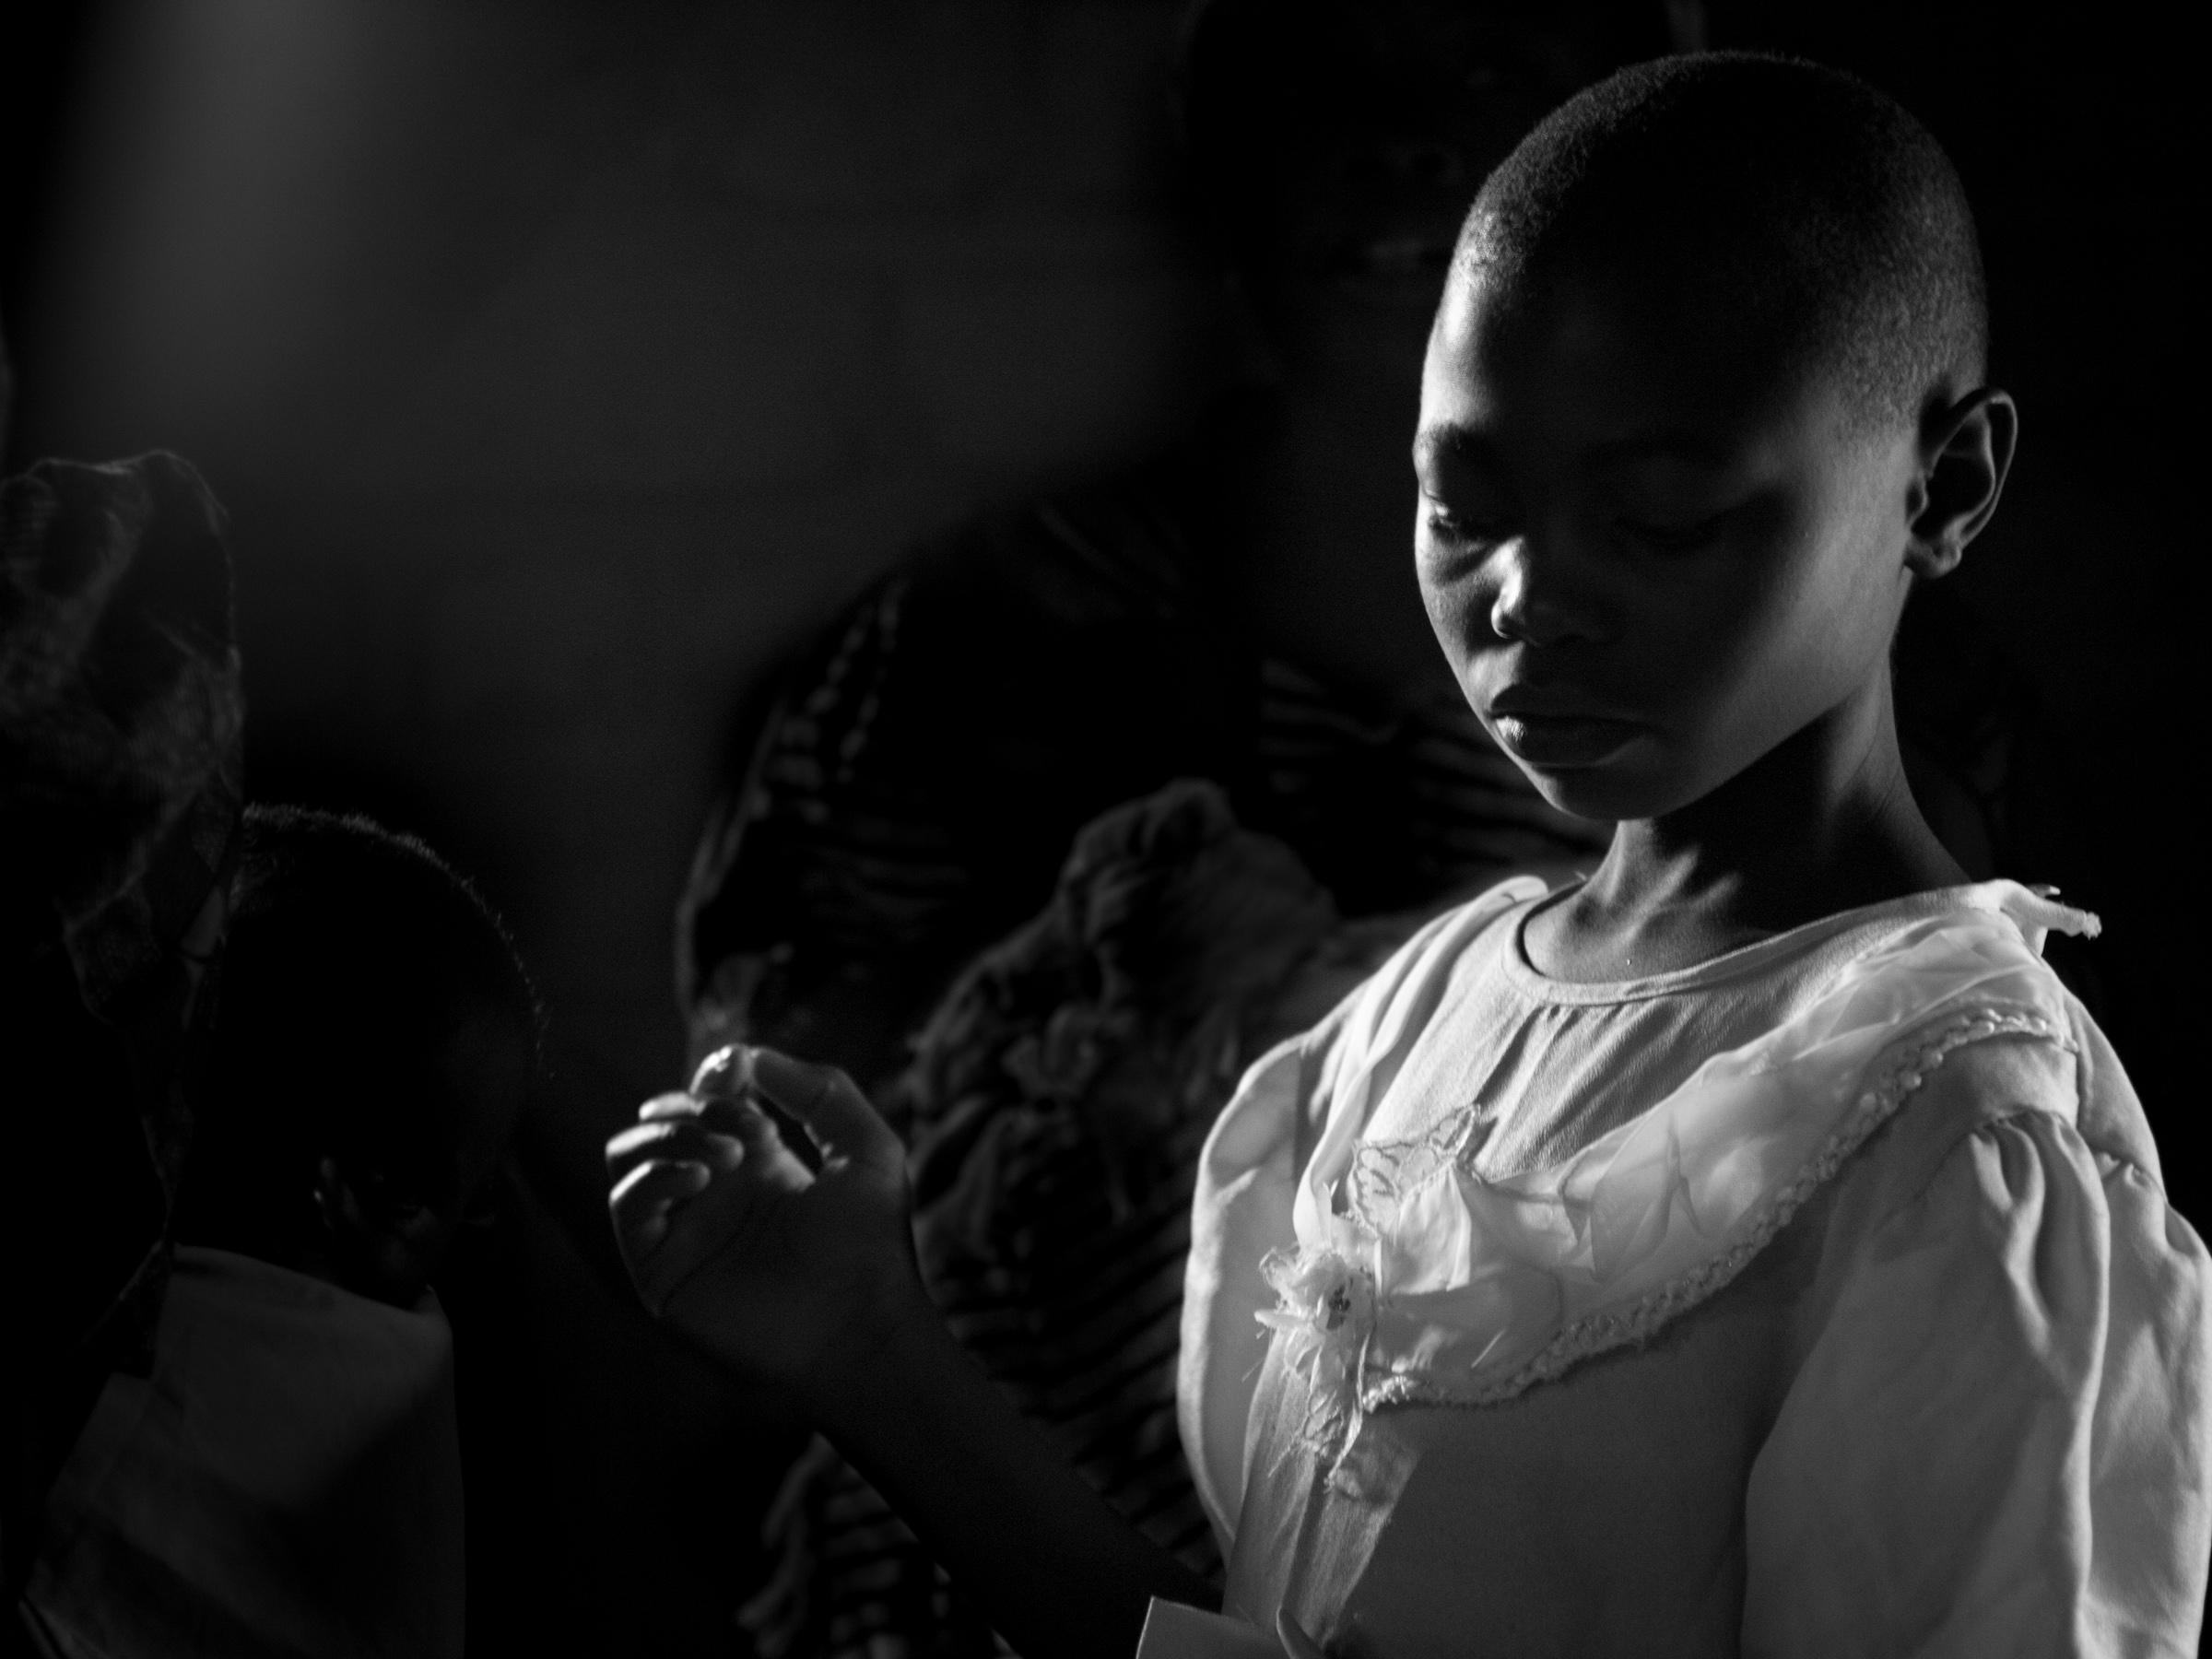 Emiliano Tidona_Series Nord Kivu Portraits_Untitled 3.jpg